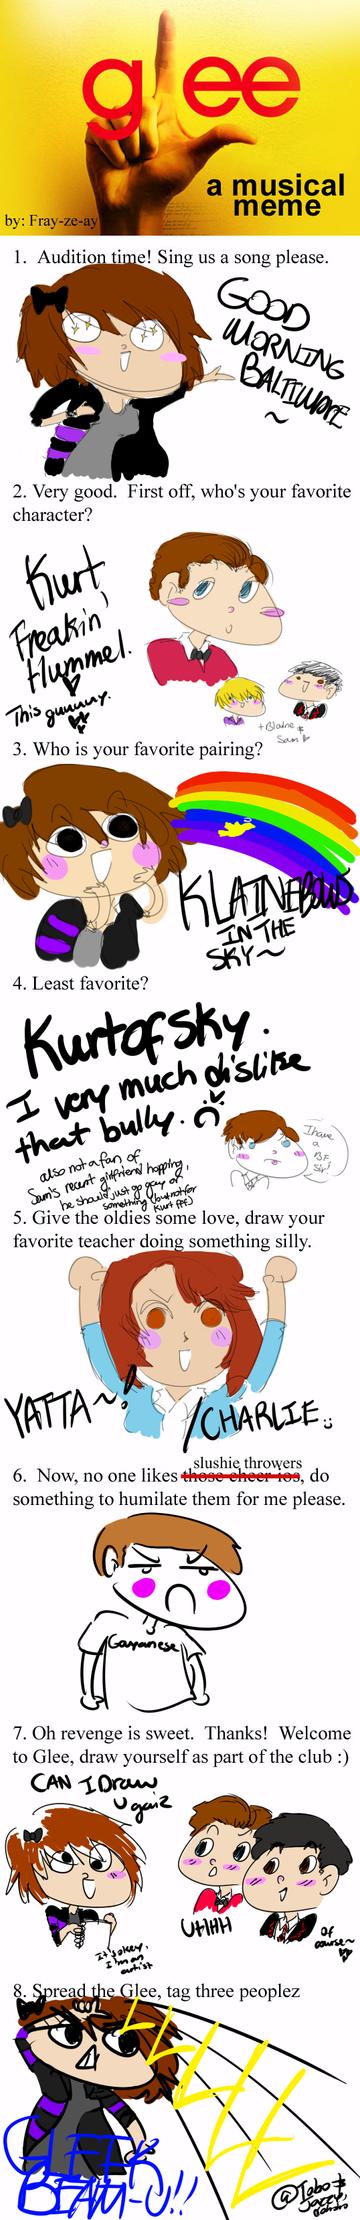 Glee Meme by inugirl289